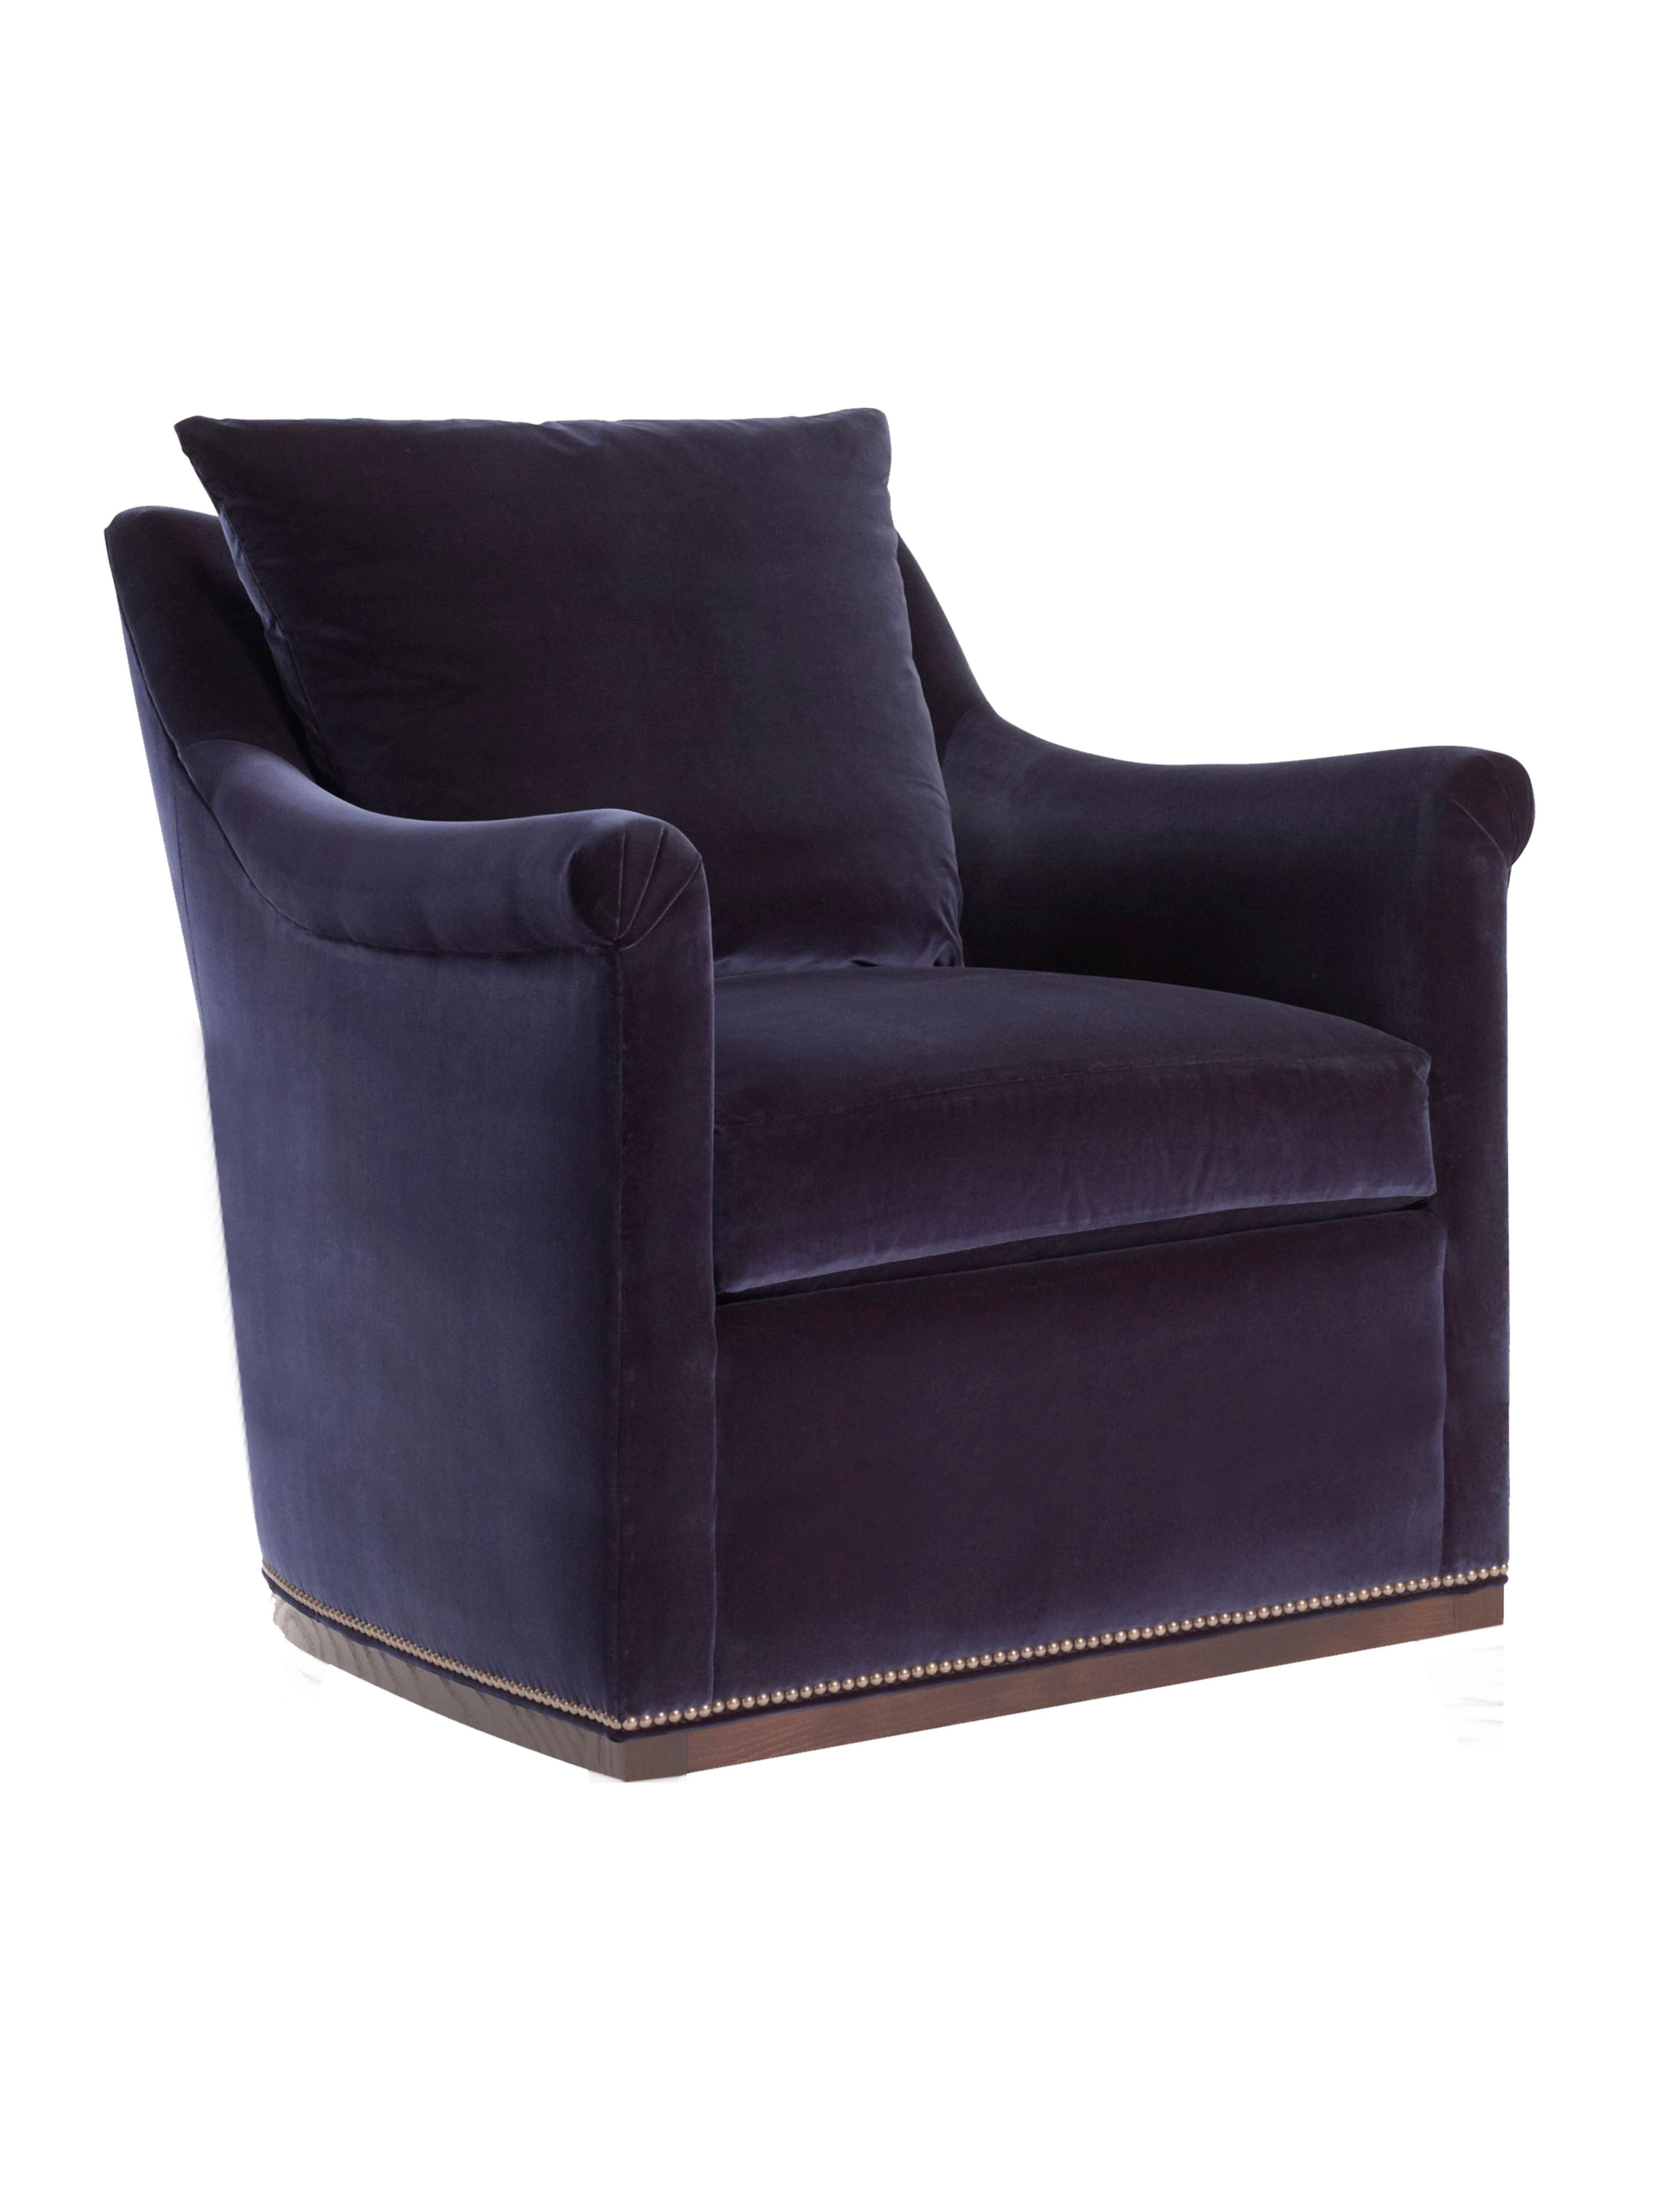 Jules Low Profile Swivel Chair In 2019 Sofa Furniture